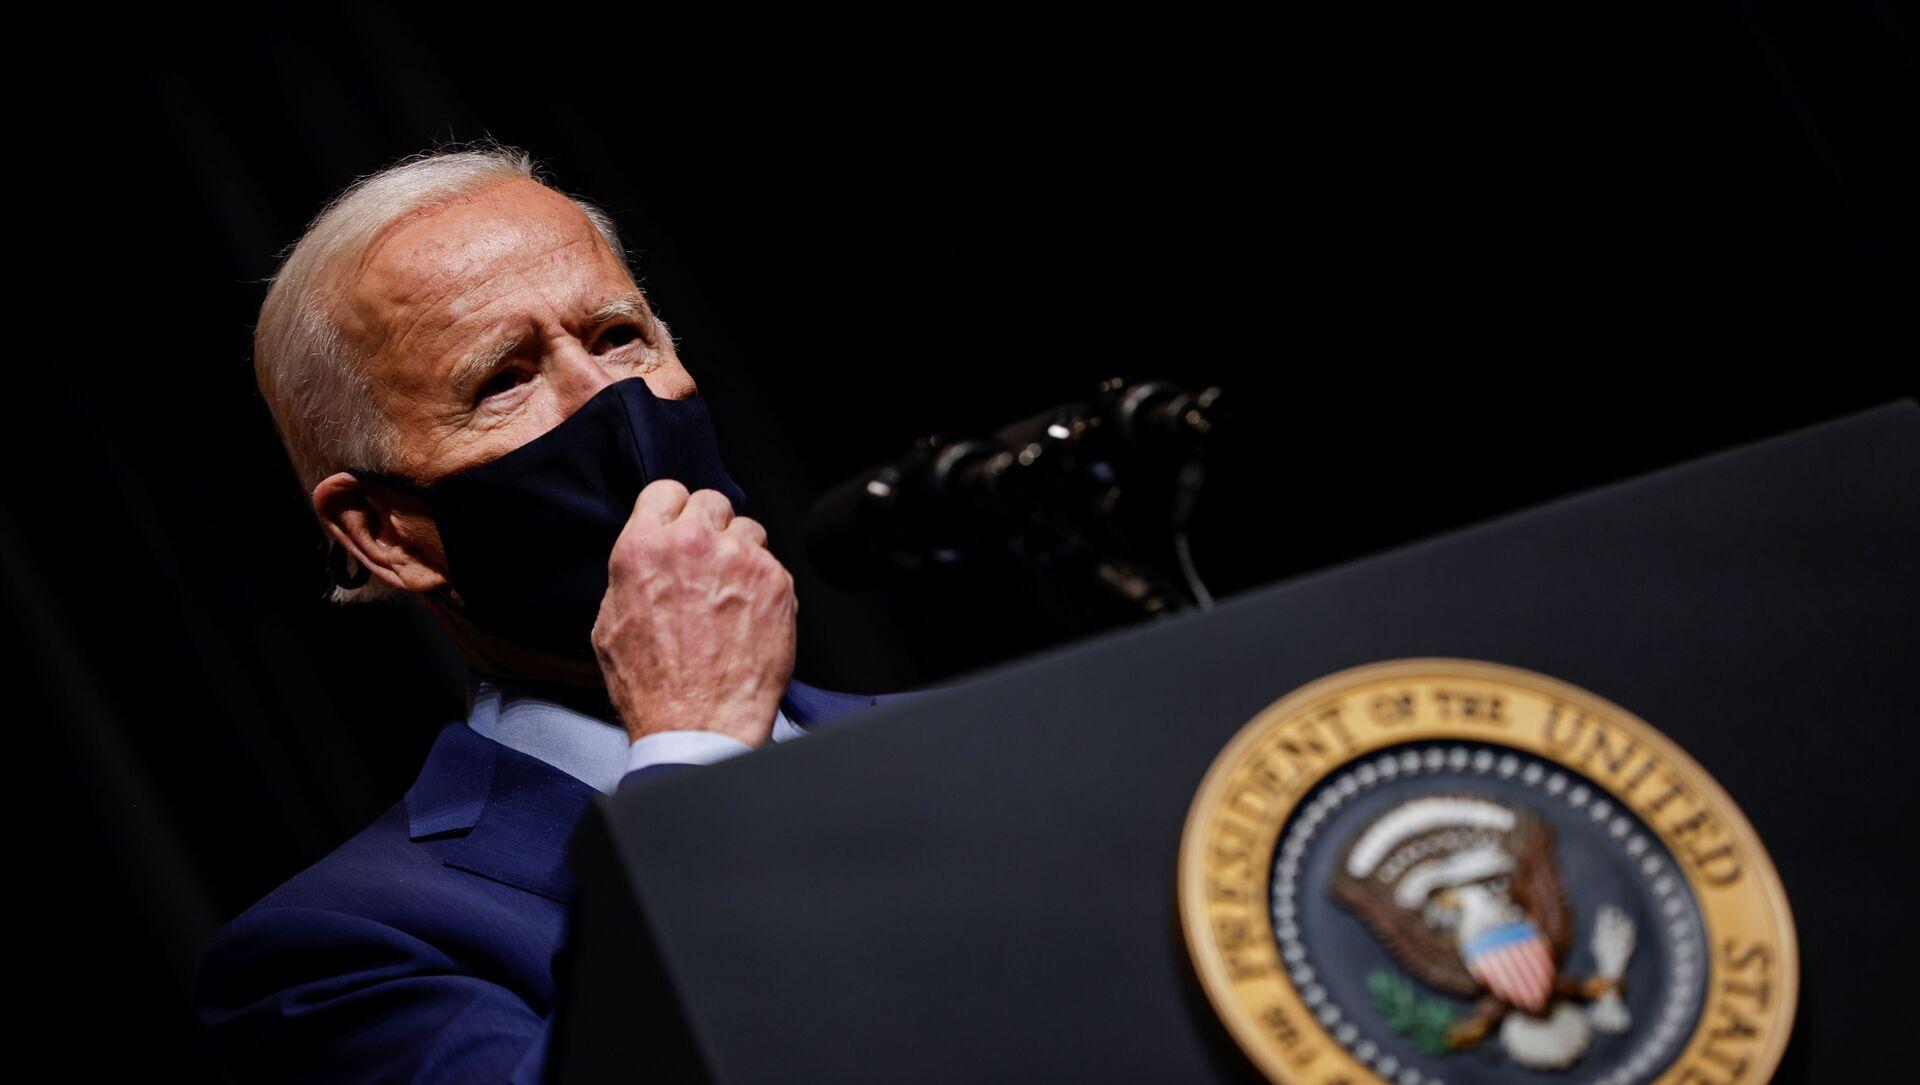 U.S. President Joe Biden removes his mask to address NIH staff during a visit to NIH in Bethesda, Maryland, U.S., February 11, 2021.  - Sputnik International, 1920, 20.02.2021